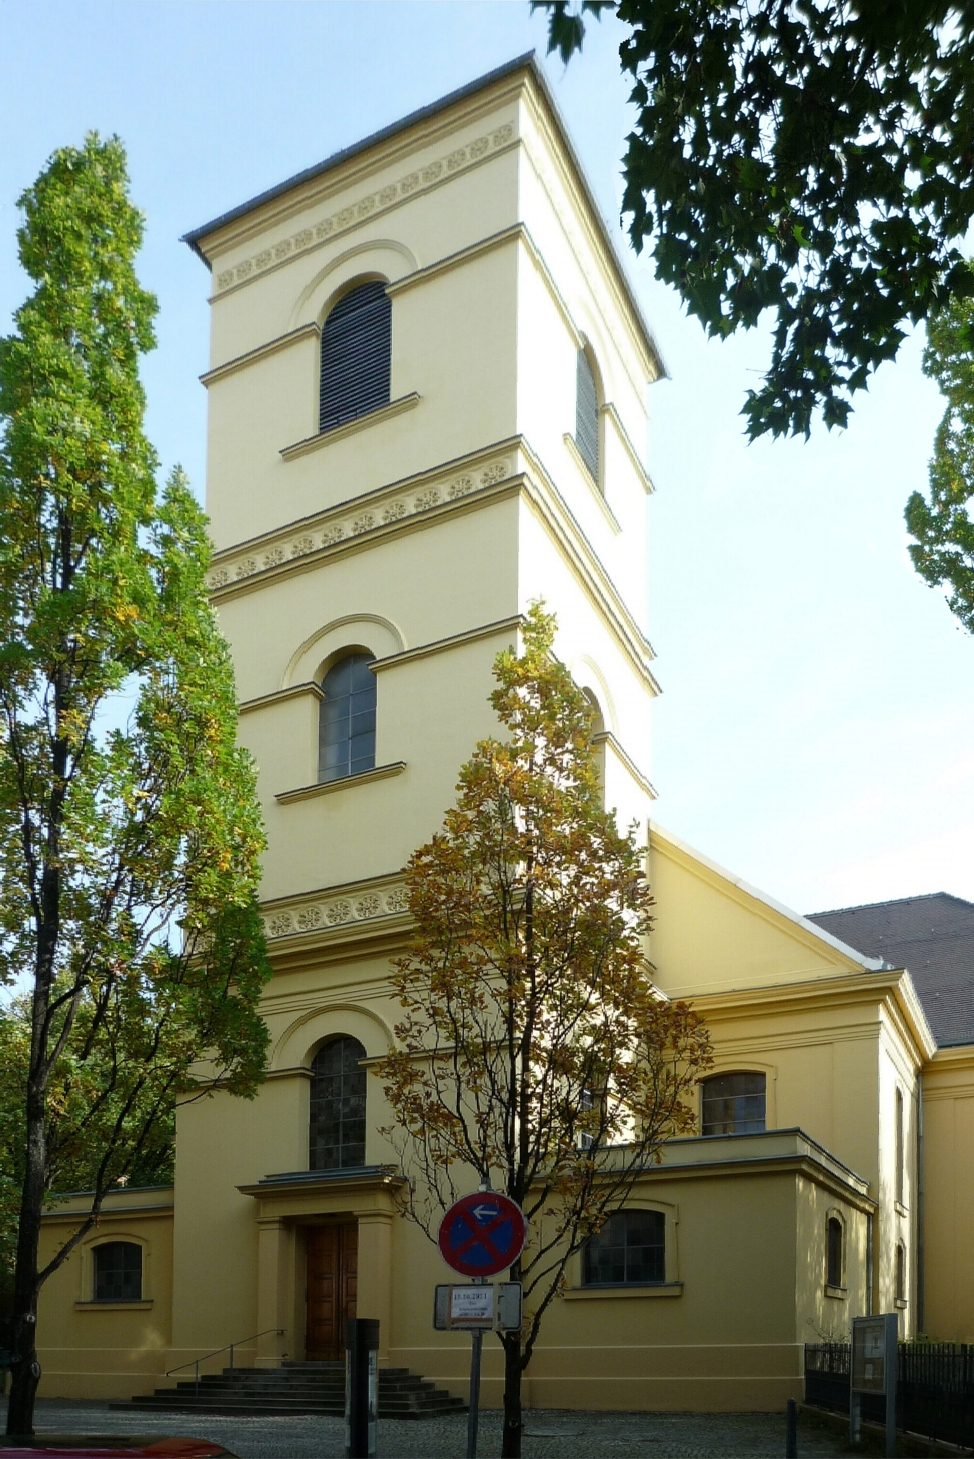 luisenkirche berlin charlottenburg wikipedia. Black Bedroom Furniture Sets. Home Design Ideas